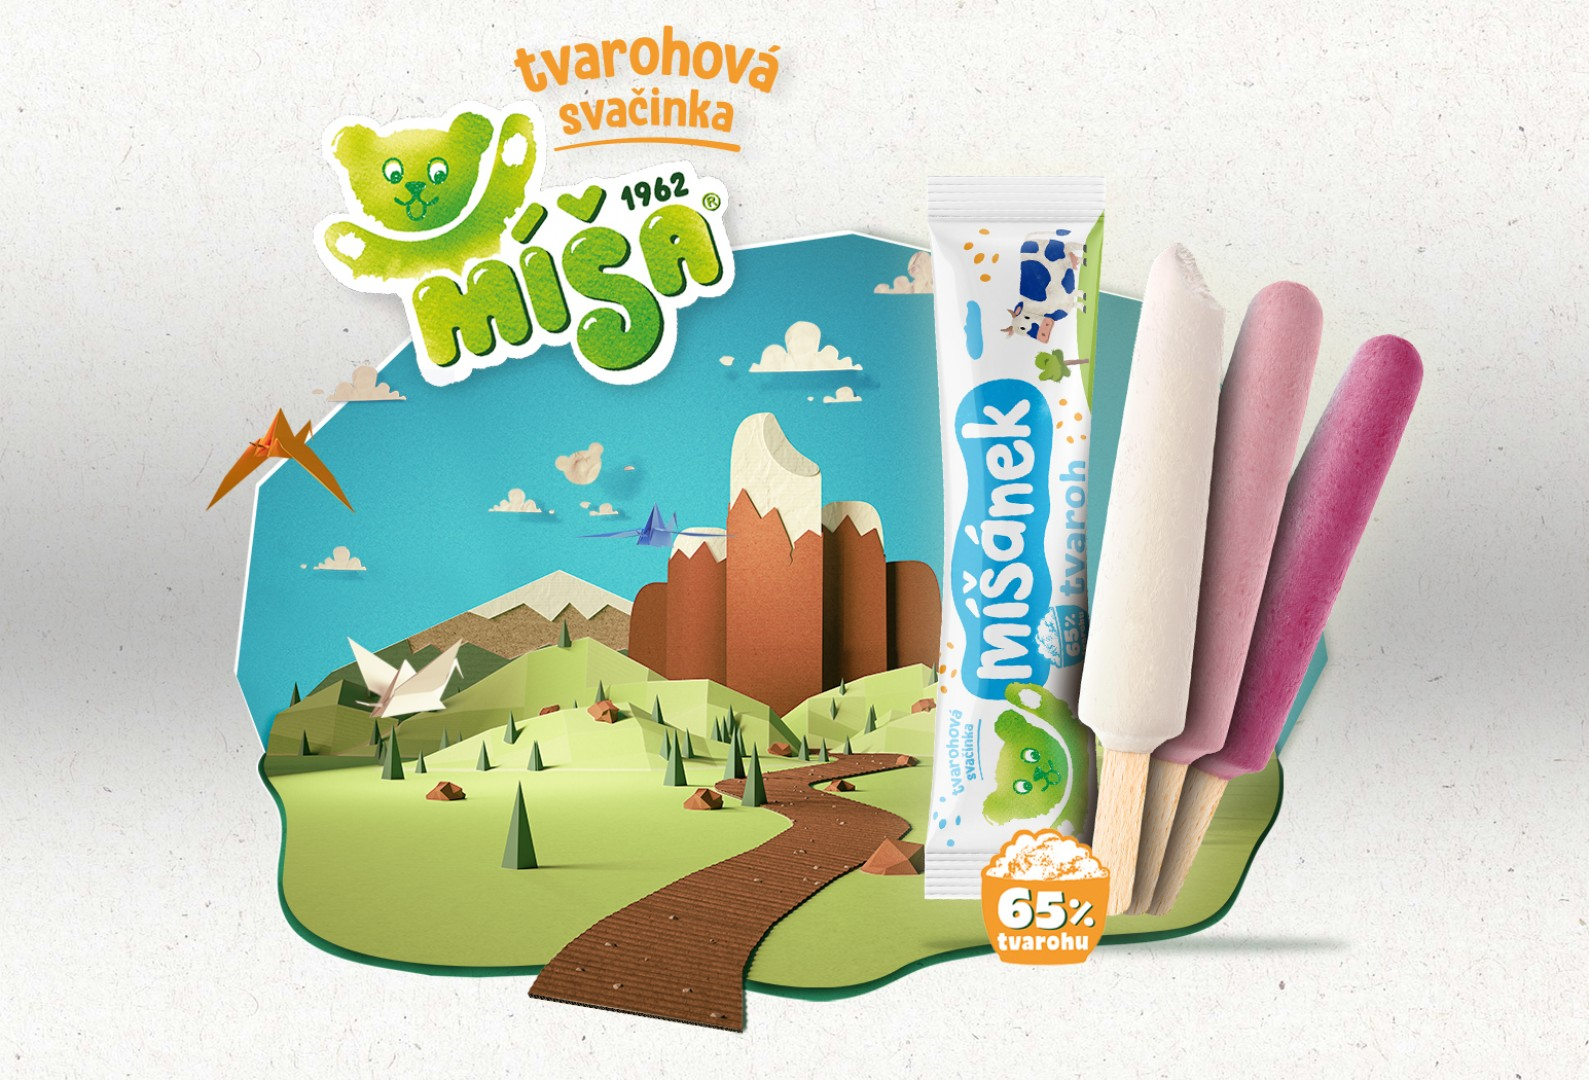 Triad and Míša take you to the quark mountain